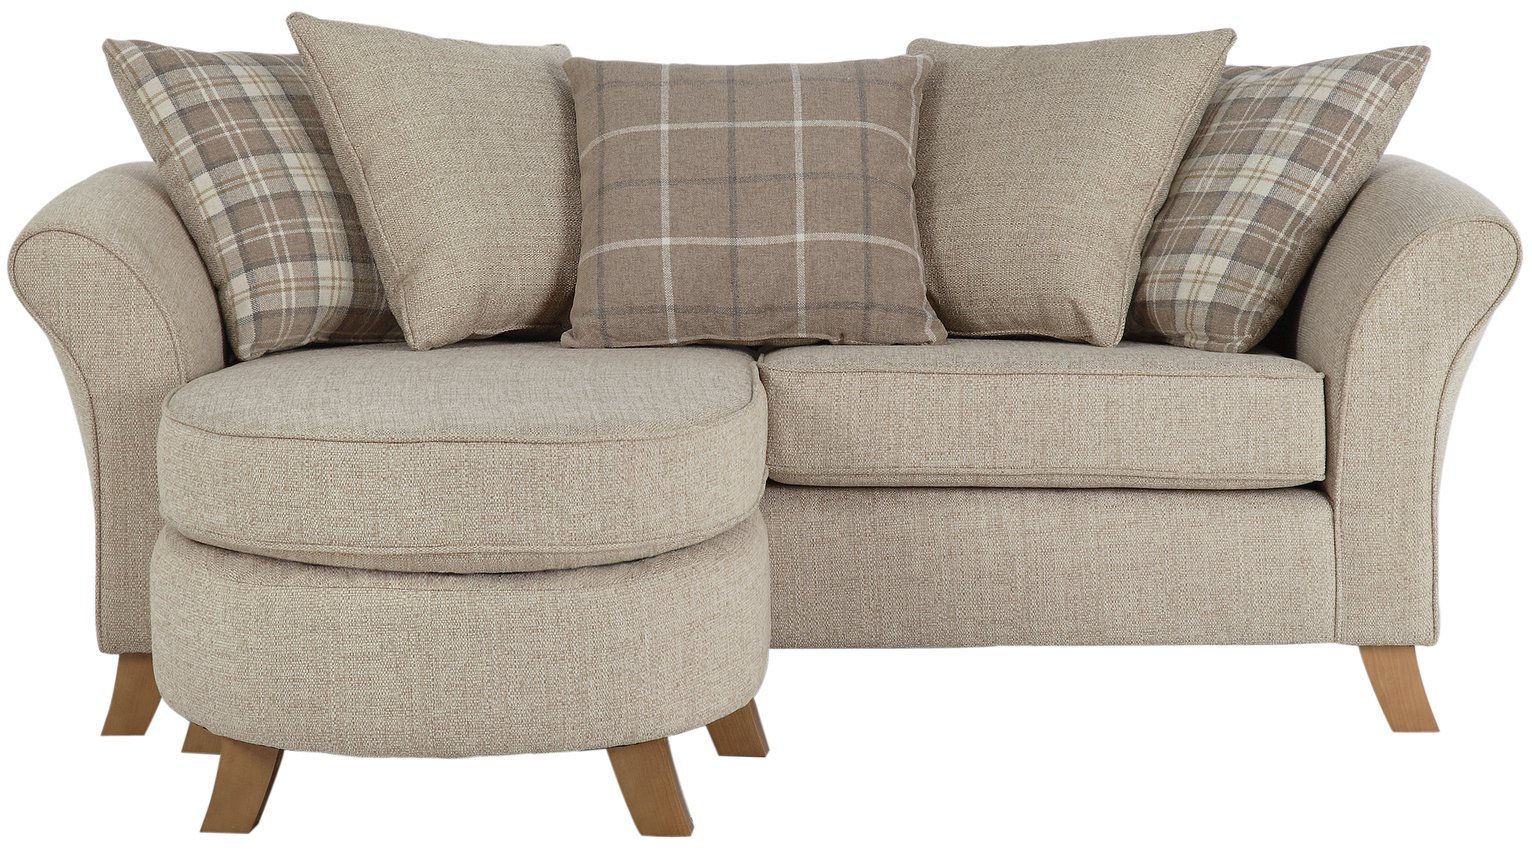 Attirant Argos Home Kayla 3 Seater Reversible Chaise Sofa   Beige